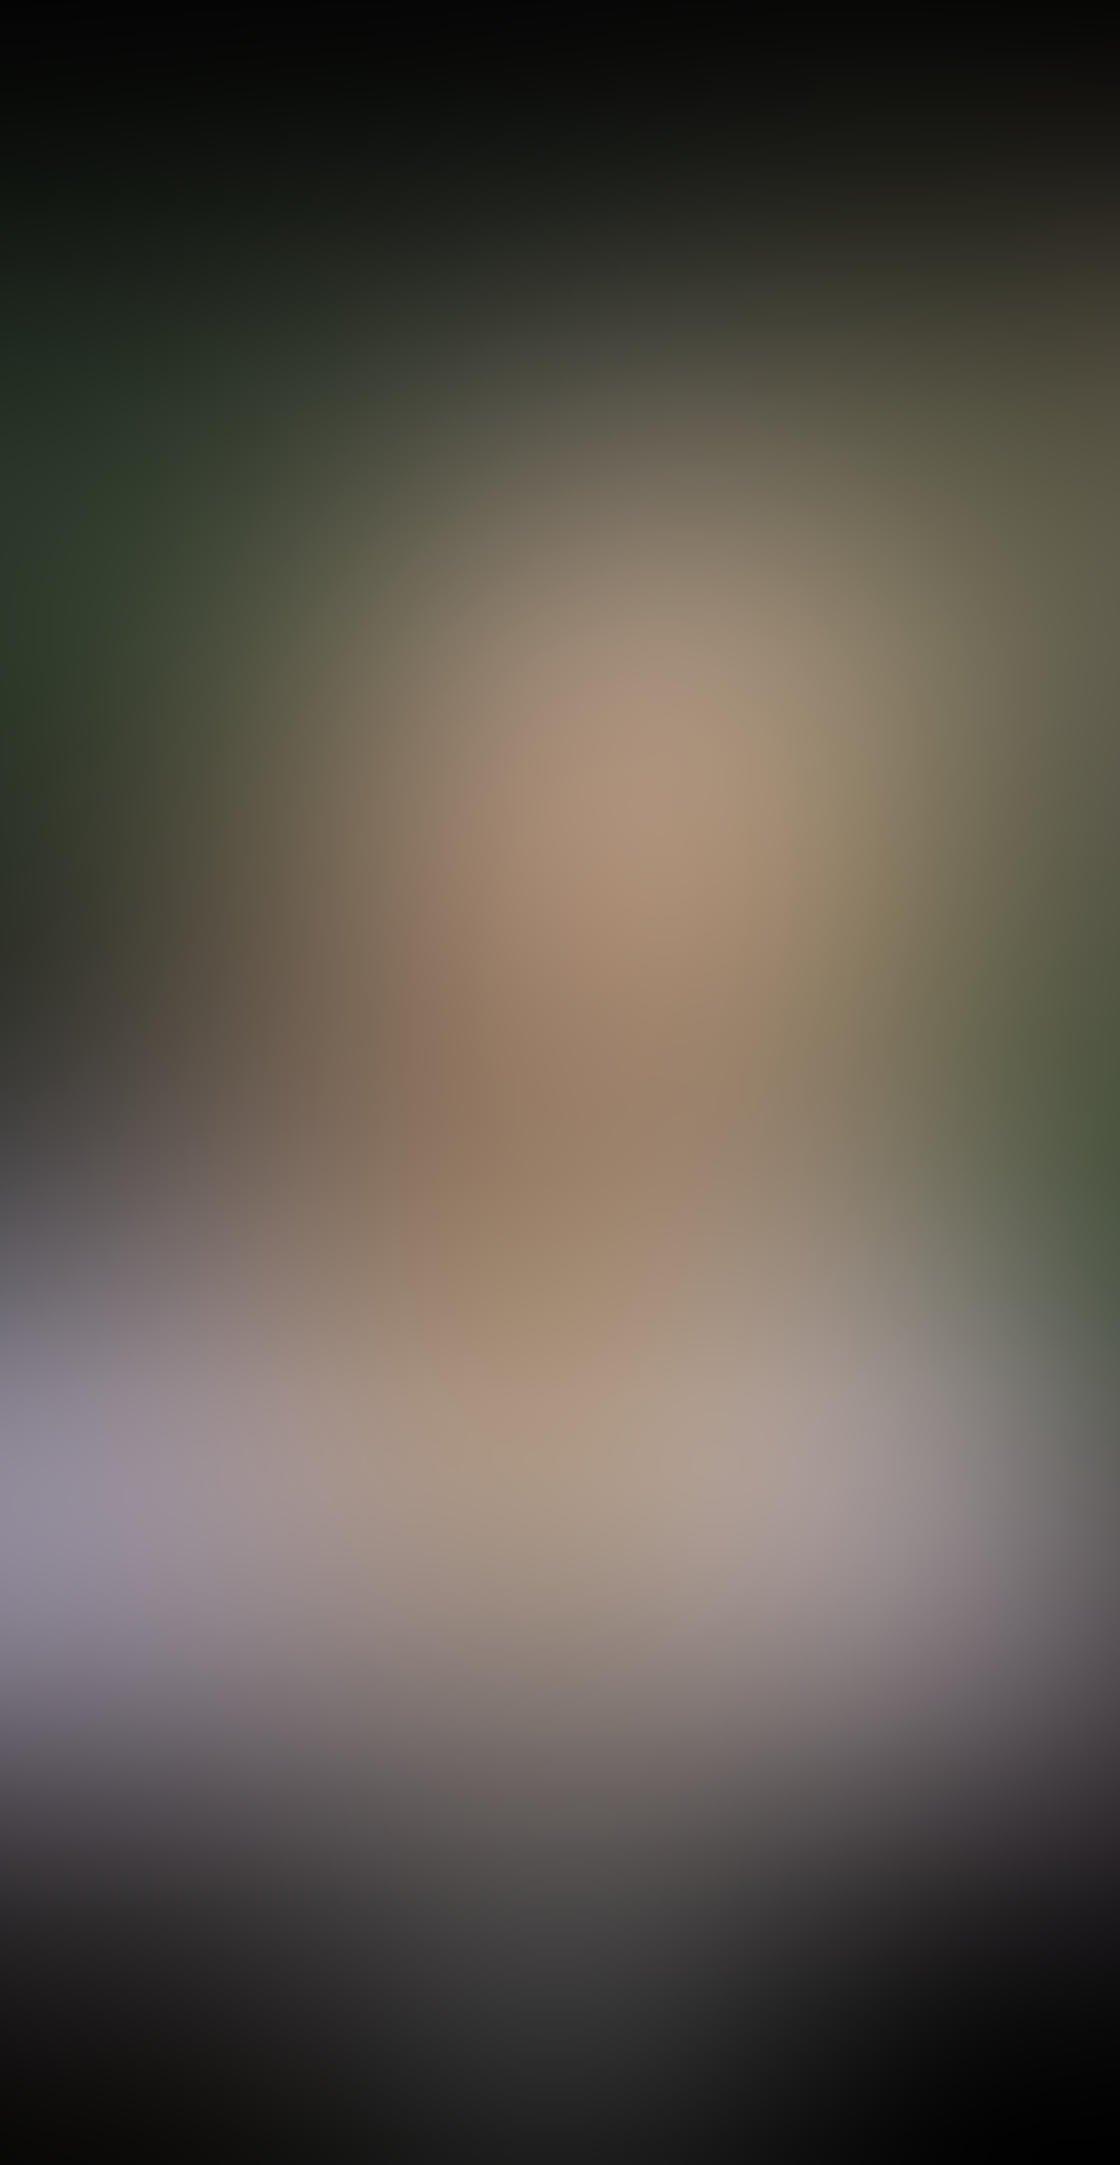 iPhone Camera Features